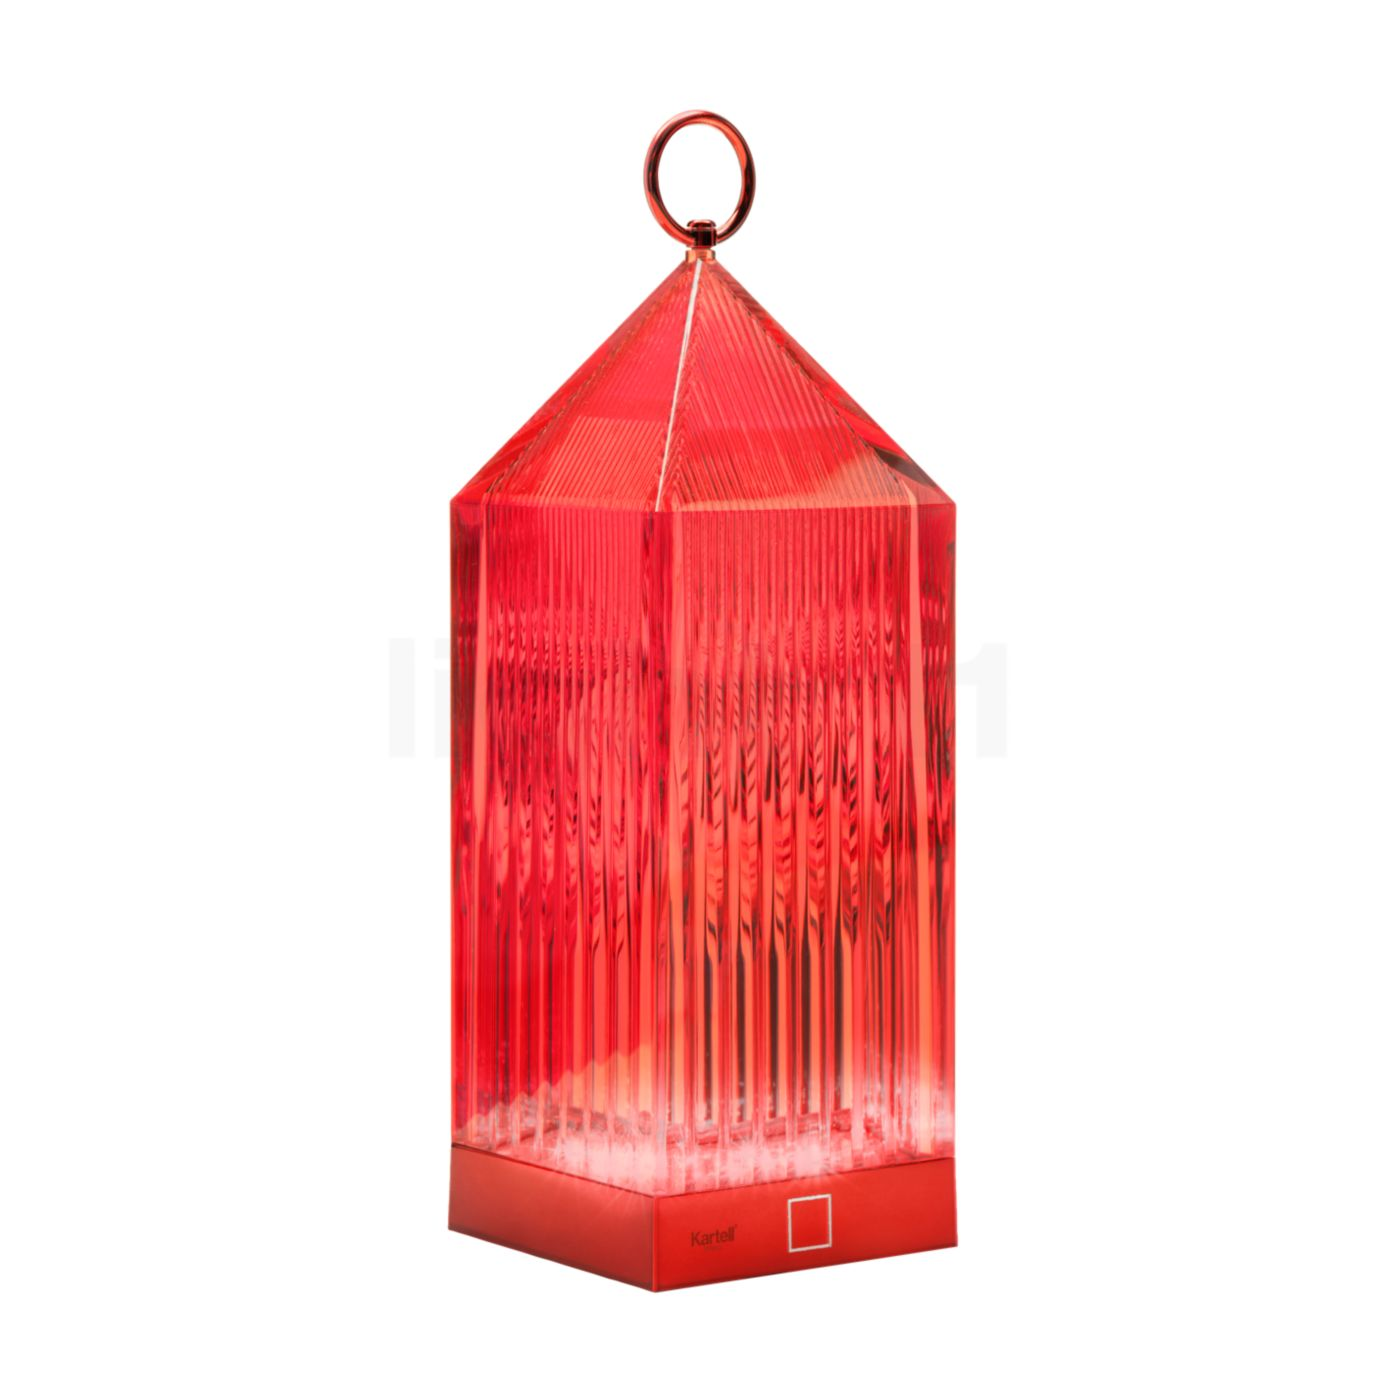 Kartell Lantern LED, rot | Lampen > Aussenlampen > Gartenleuchten | Kartell